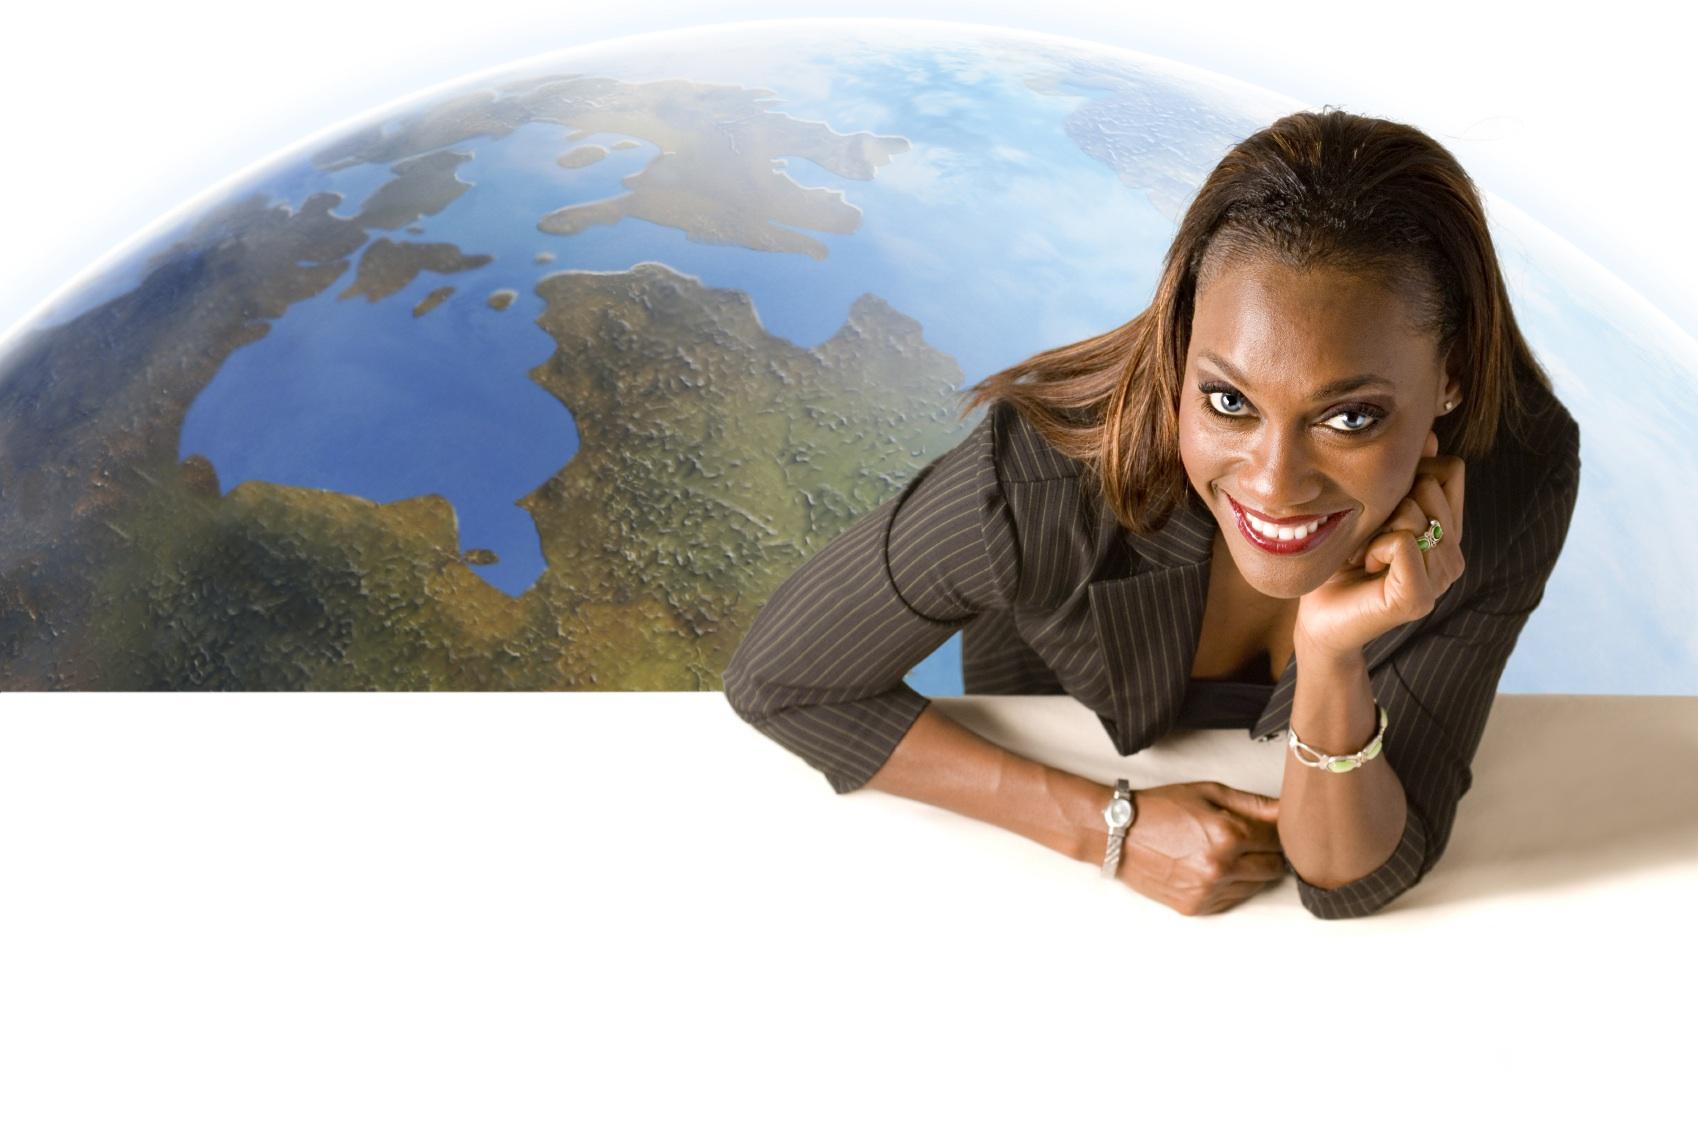 YouMeWe Women Entrepreneurs' Community